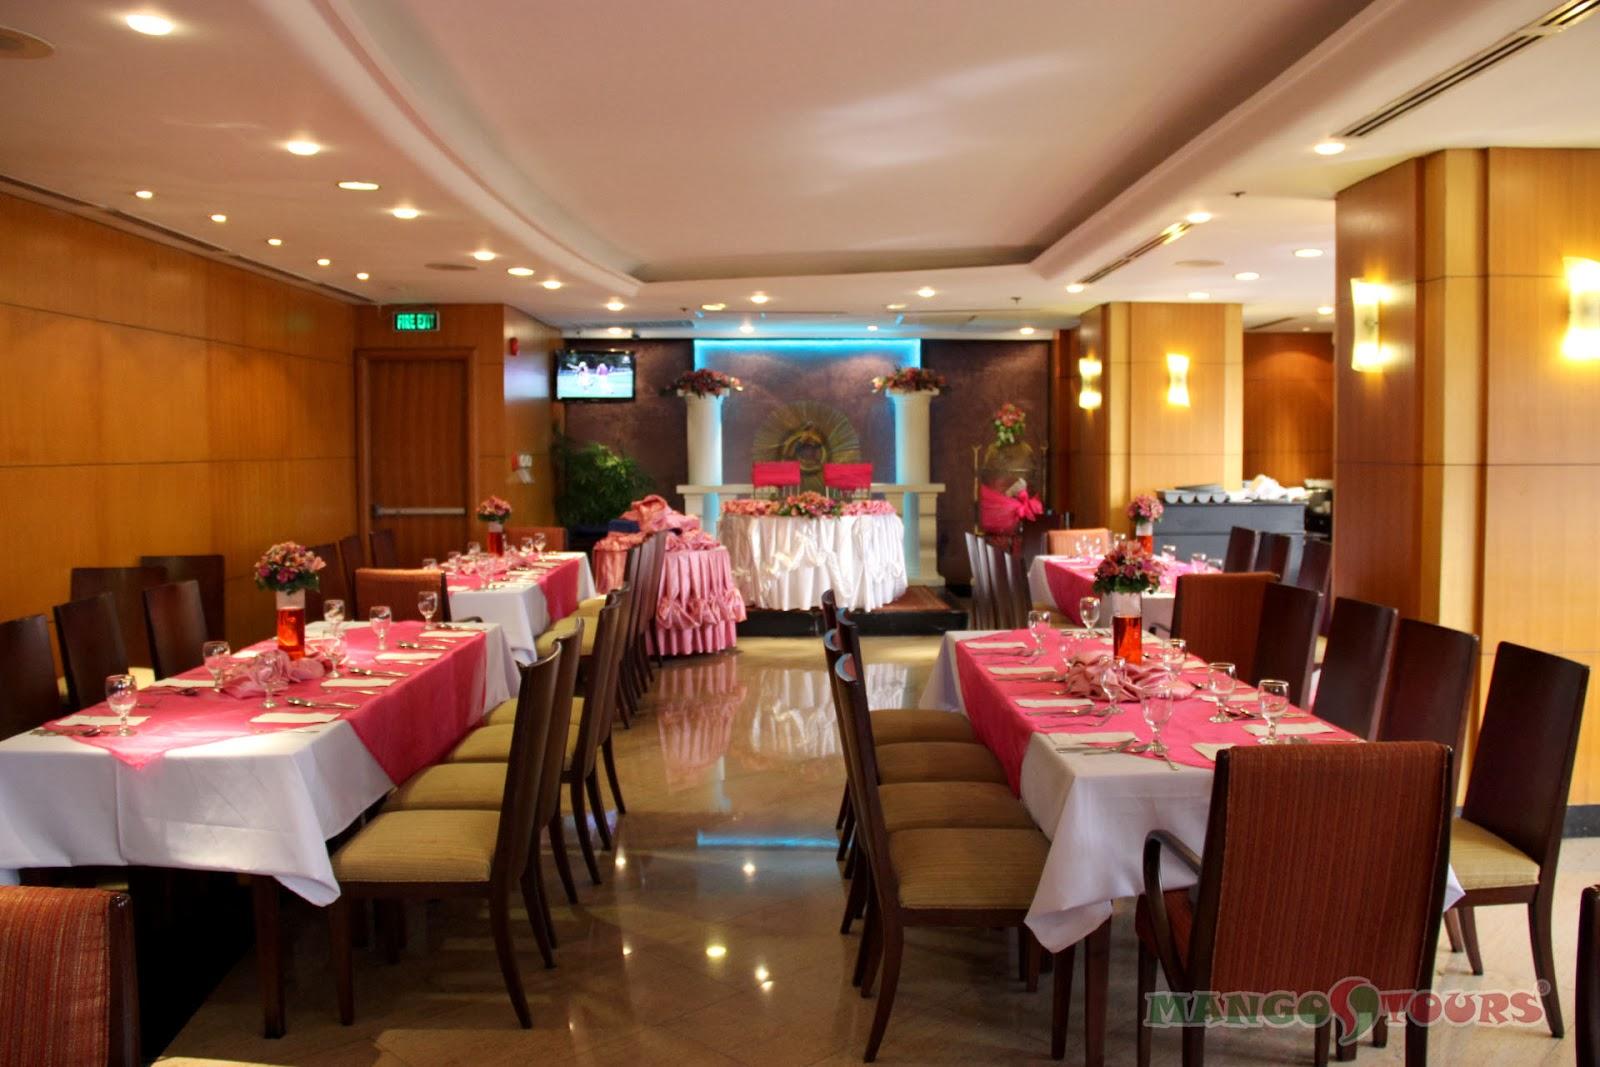 Comfort at Its Peak: City Garden Hotel Makati